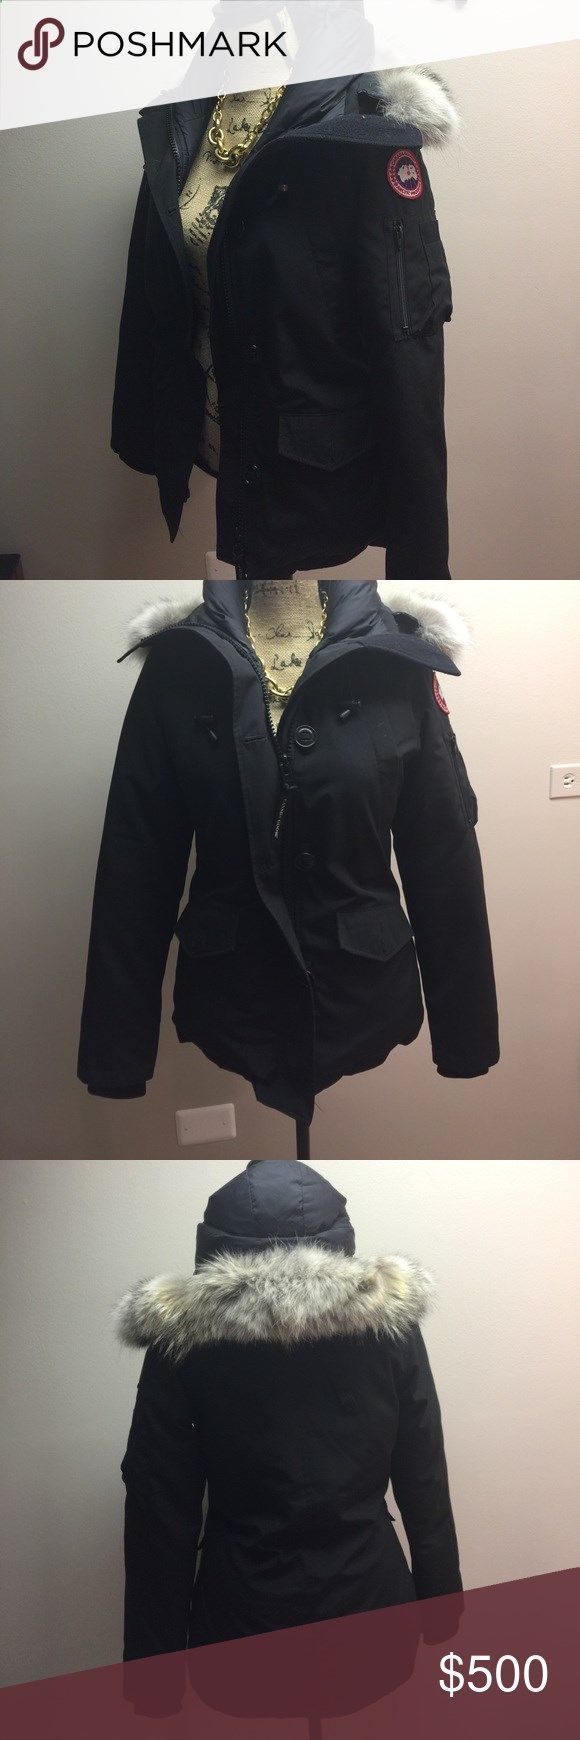 Canada Goose coat Canada Goose MONTEBELLO DOWN PARKA coat with genuine fur trim. Canada Goose Jackets Coats #Down&Parkas